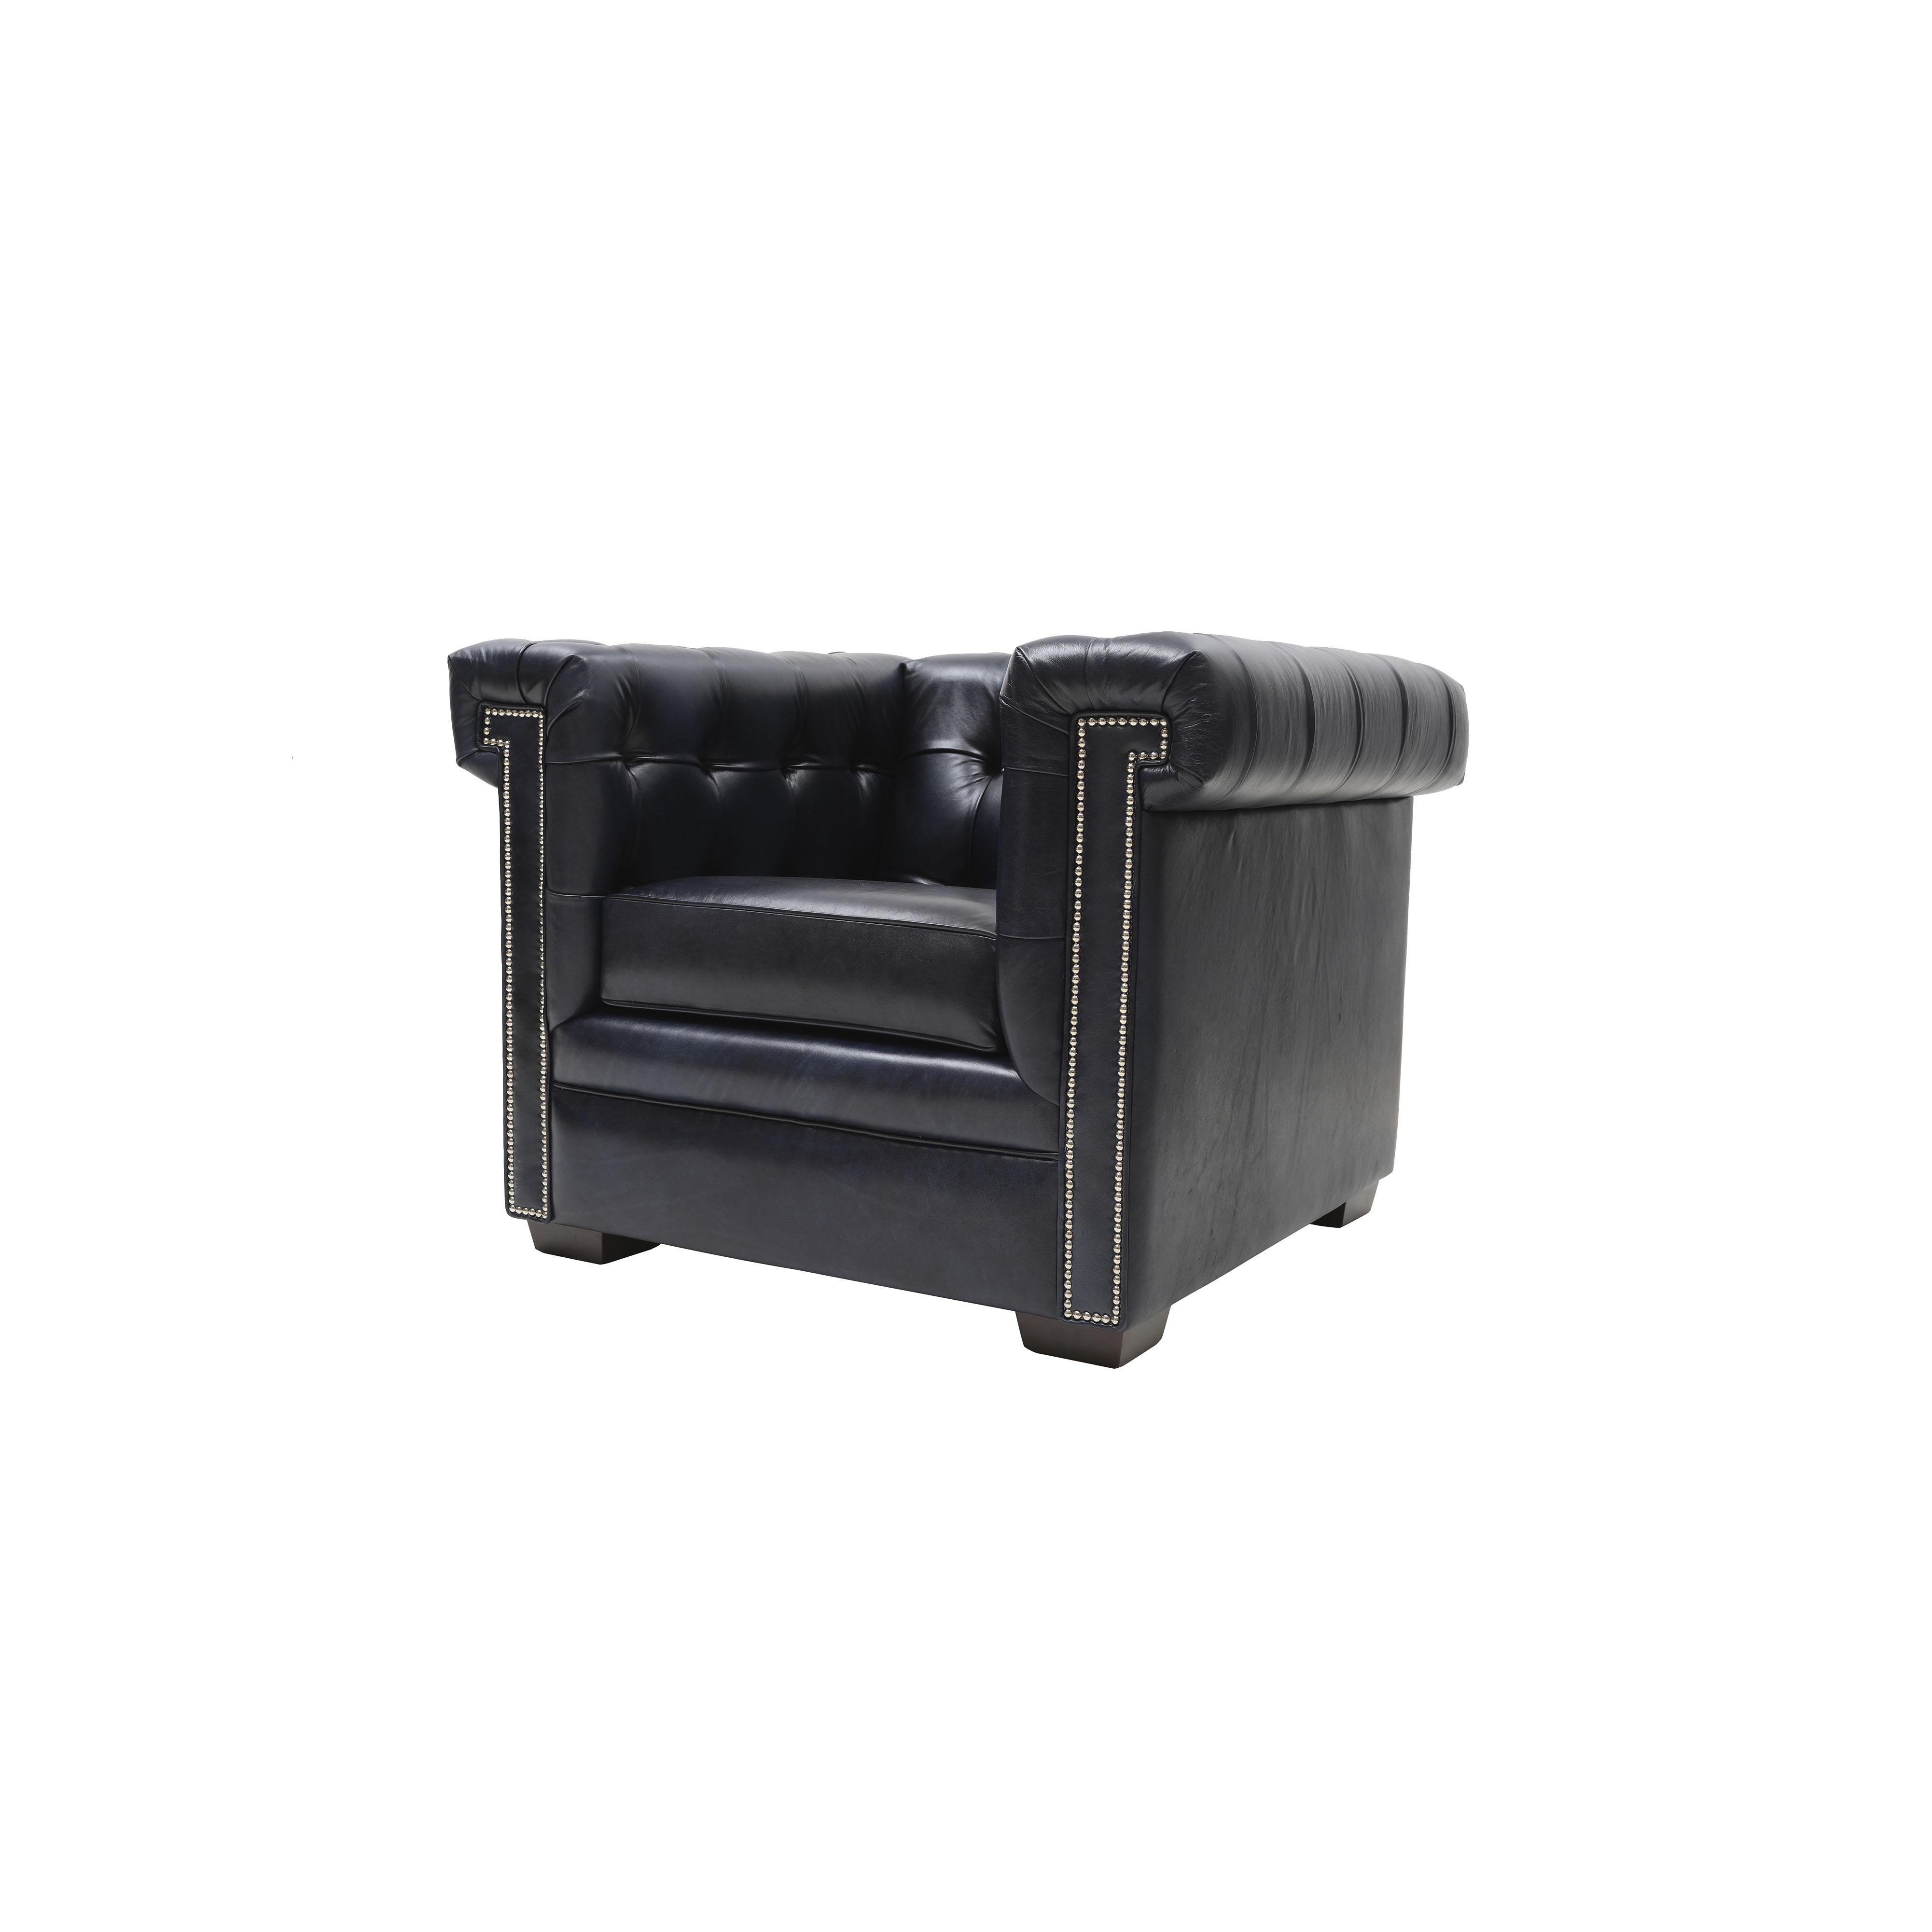 Lord armchair